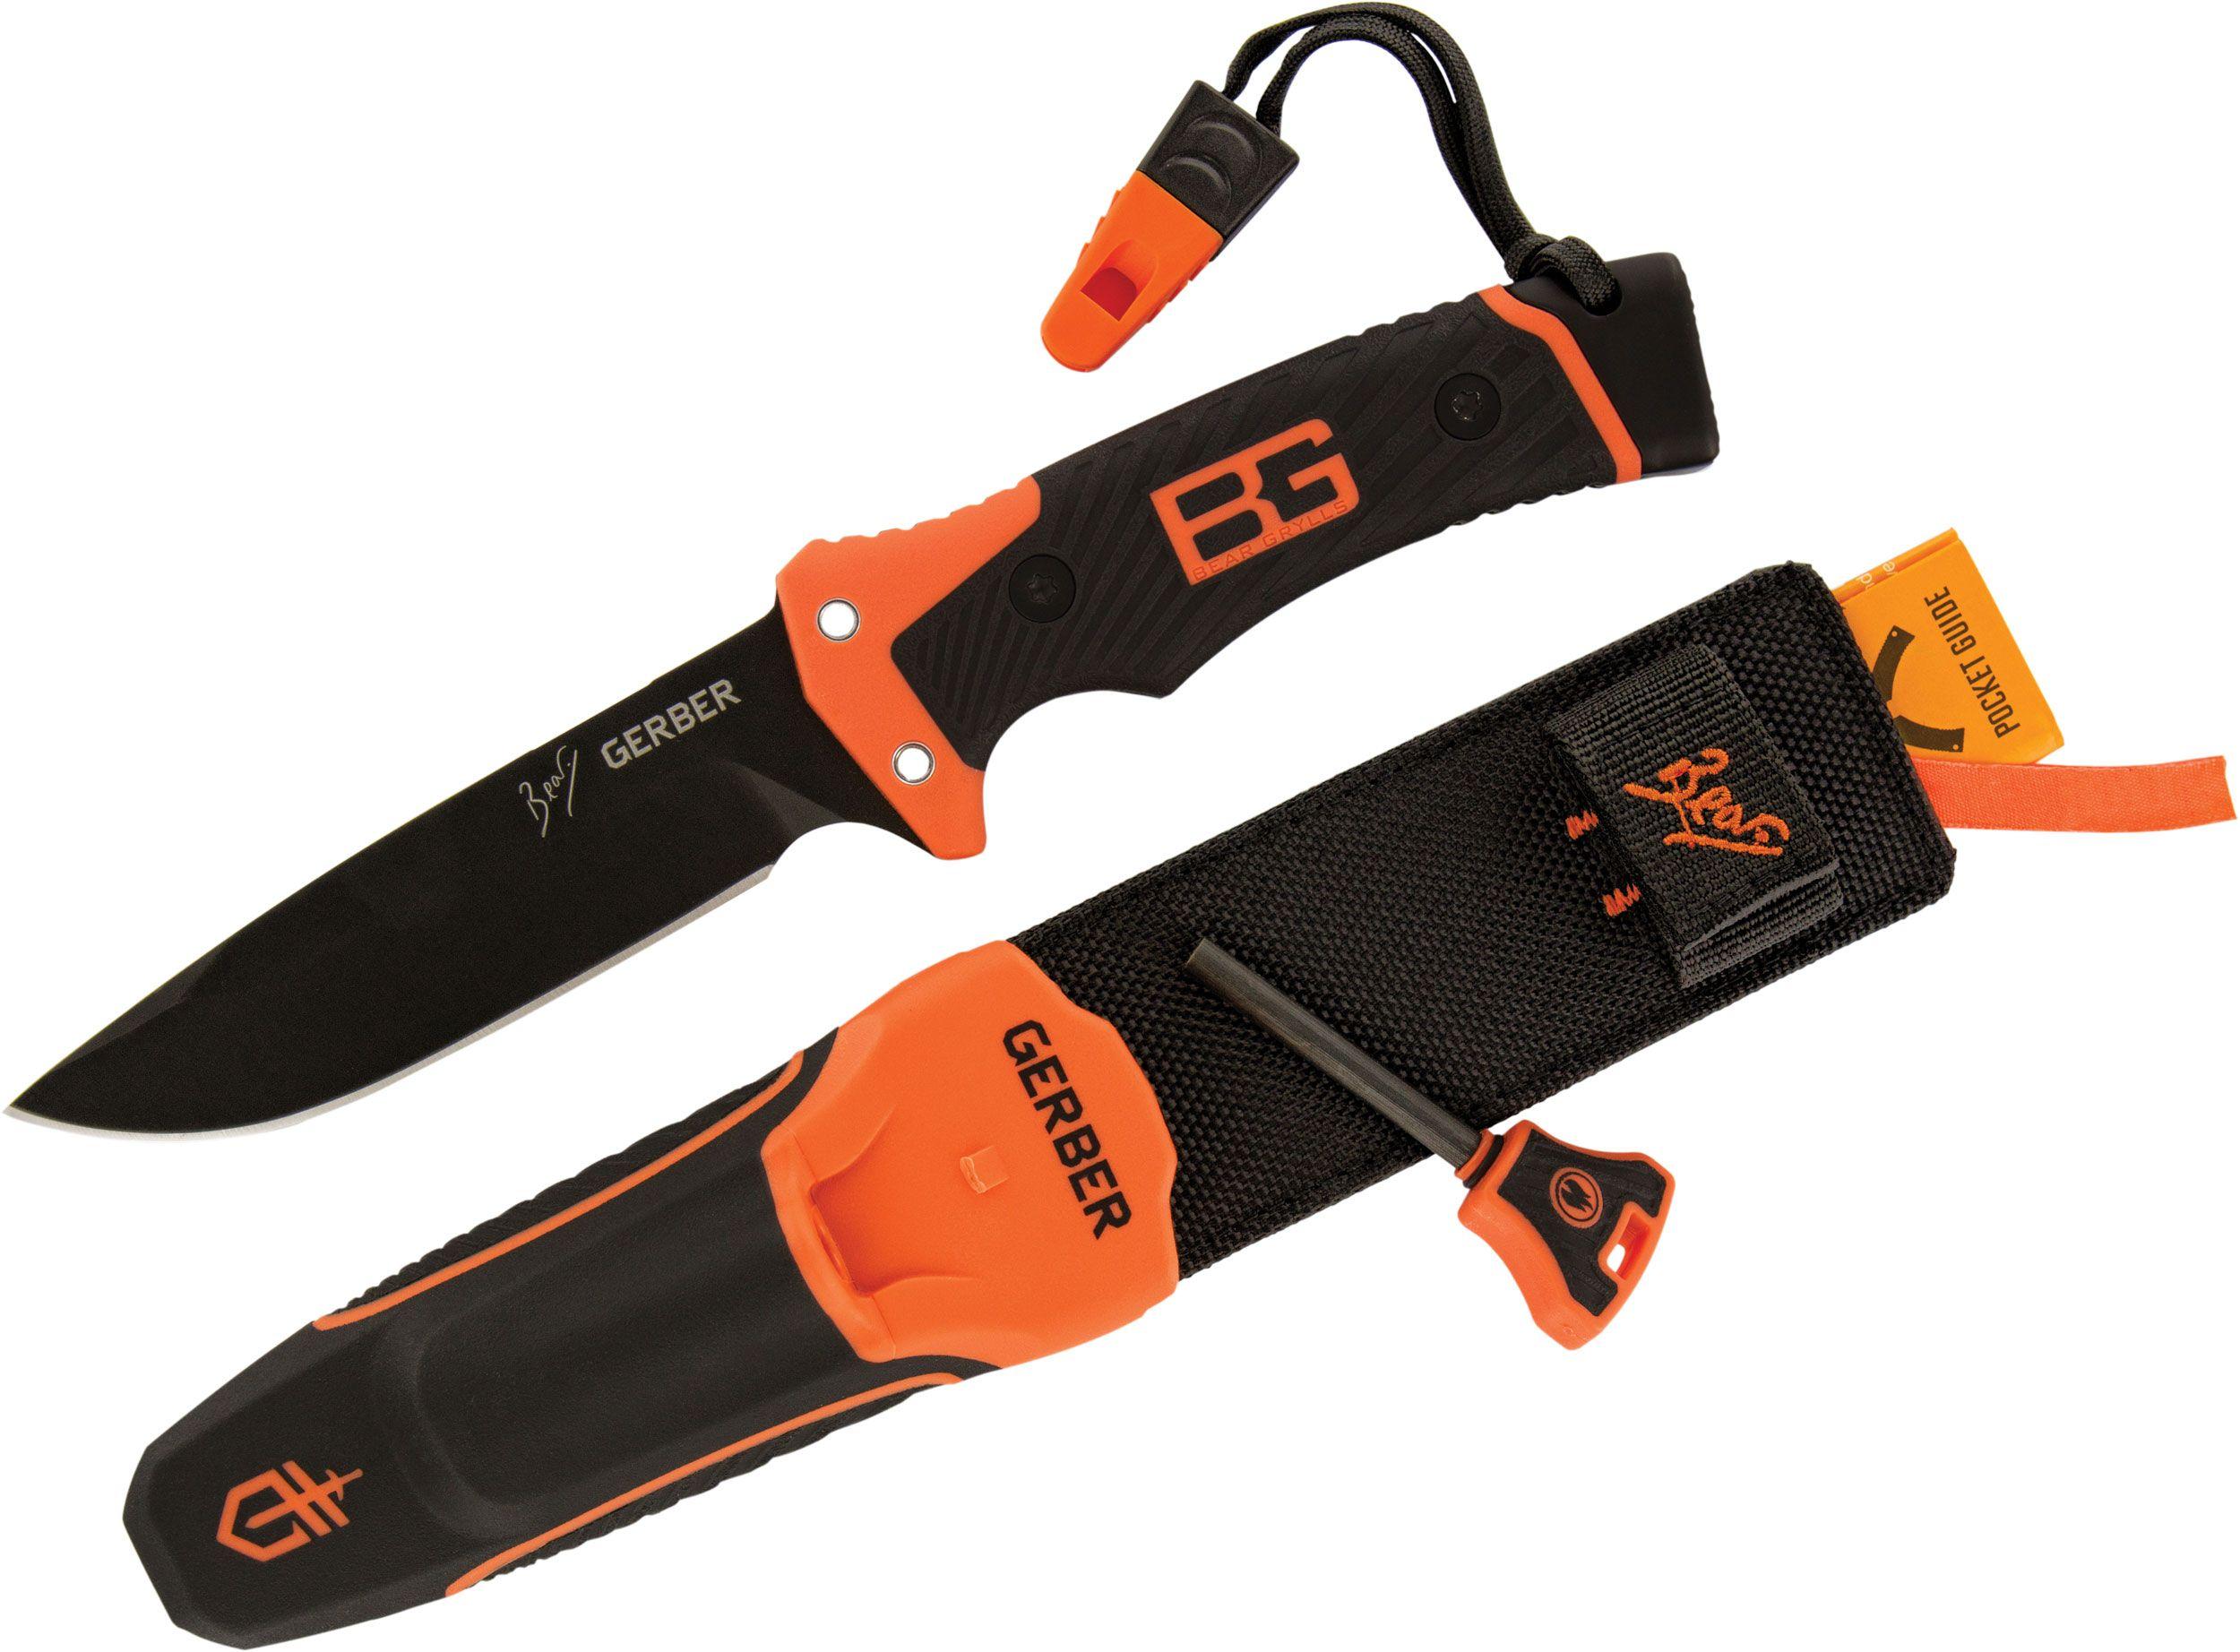 Gerber 31-001901 Bear Grylls Ultimate Pro Survival Knife 4.8 inch Plain Blade, TPE Overmold Handles